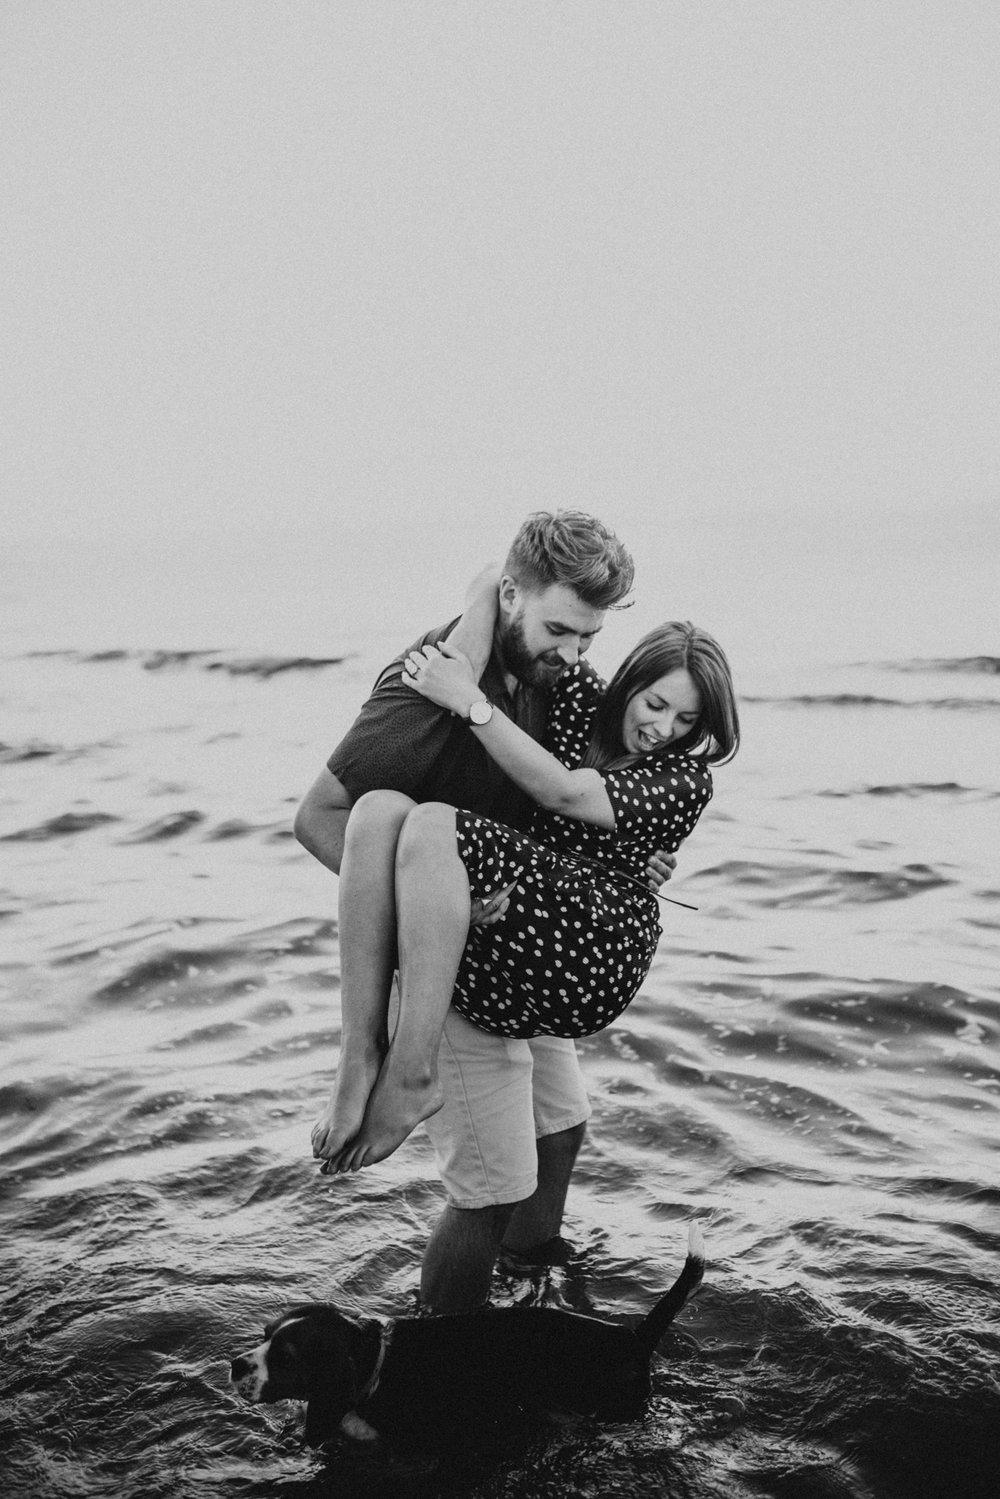 Katrina-Mike-Engagement-Beach-Coastal-Dog-Session-Shoot-Photography-Darina-Stoda-Norfolk-112.jpg